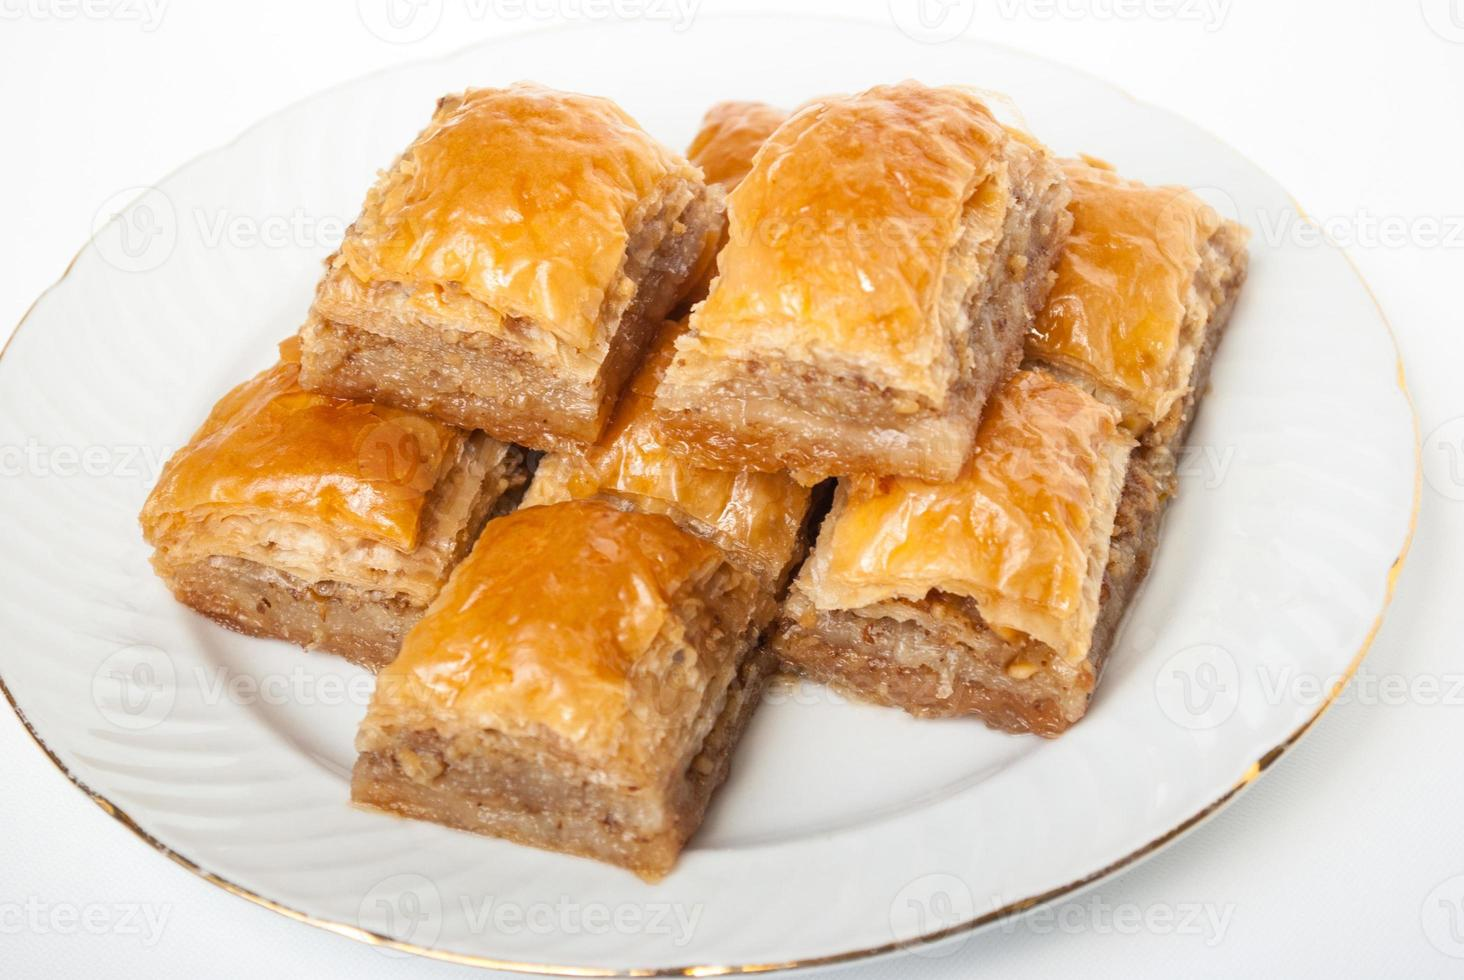 Baklava dulce en placa aislada sobre fondo blanco. foto